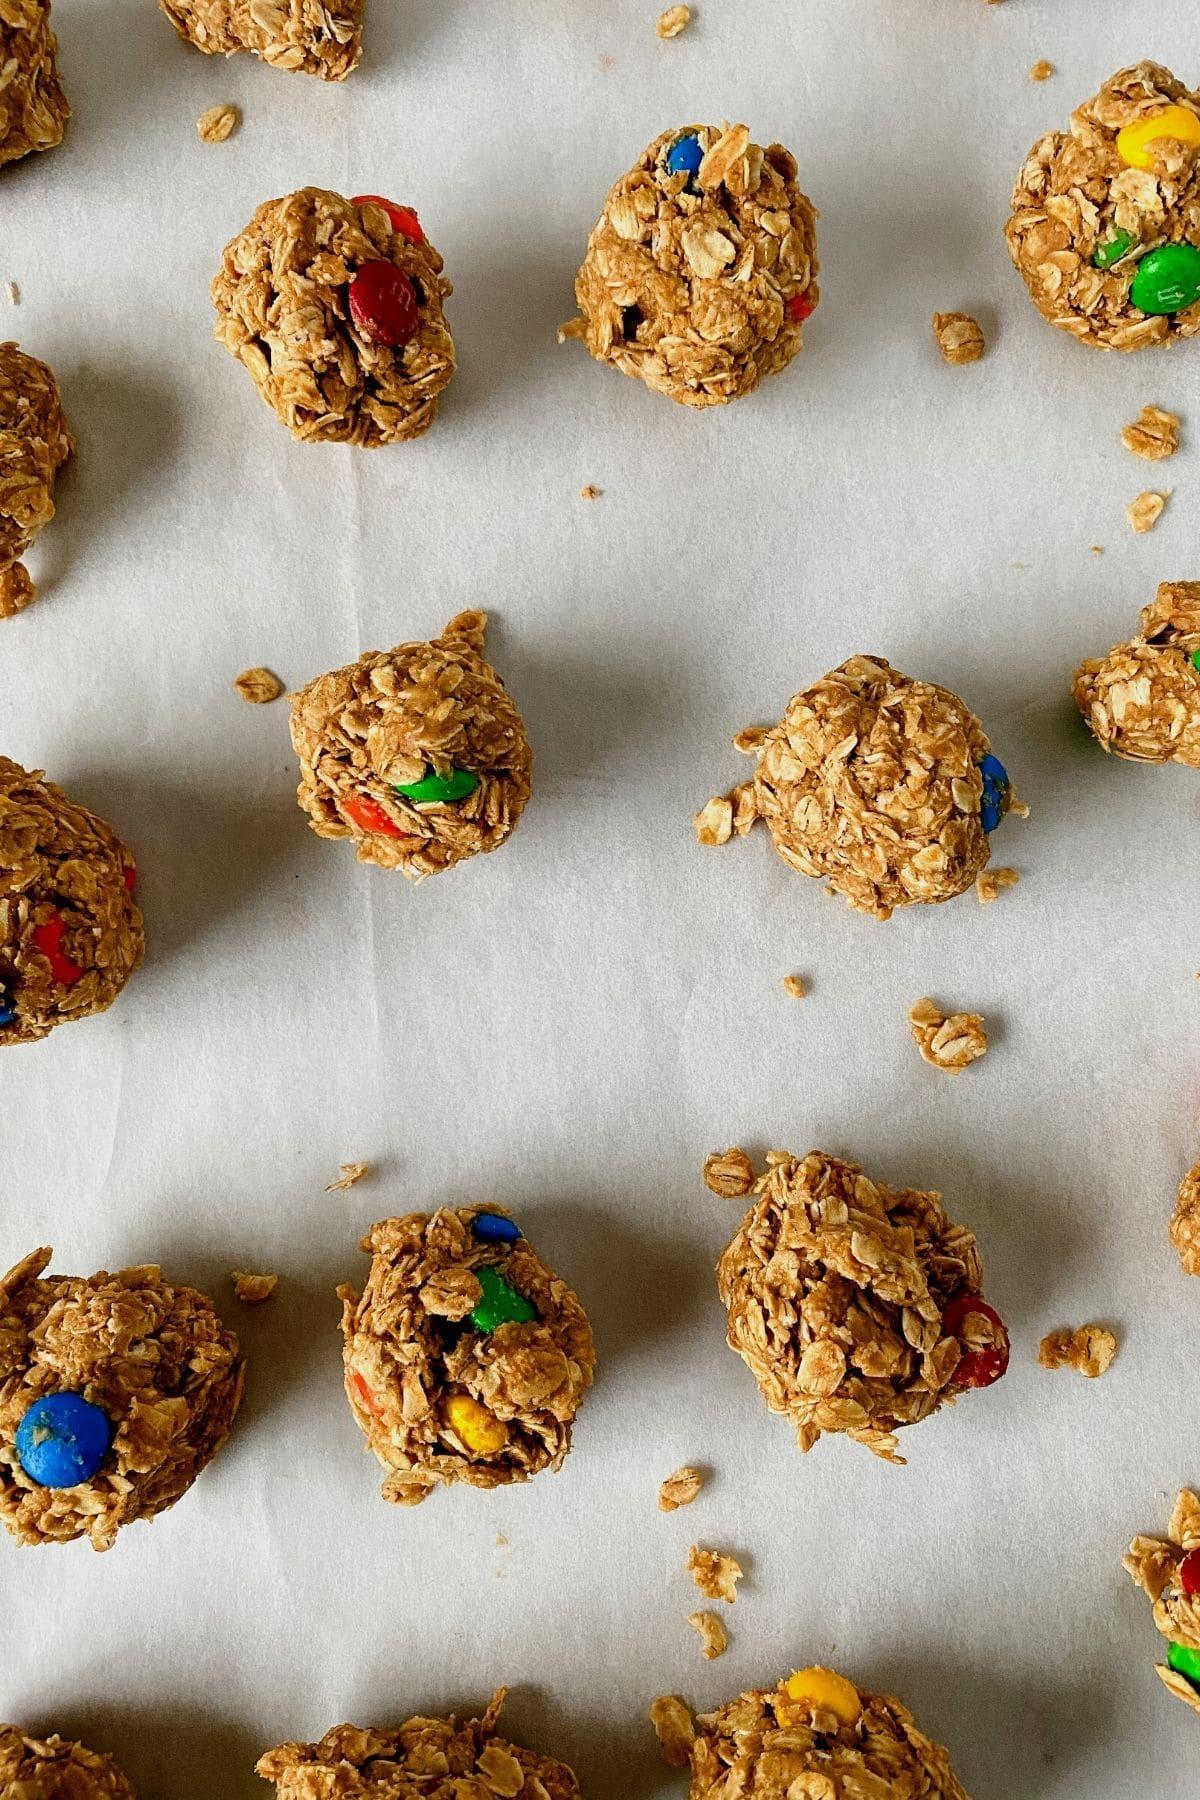 Peanut butter energy balls on baking sheet